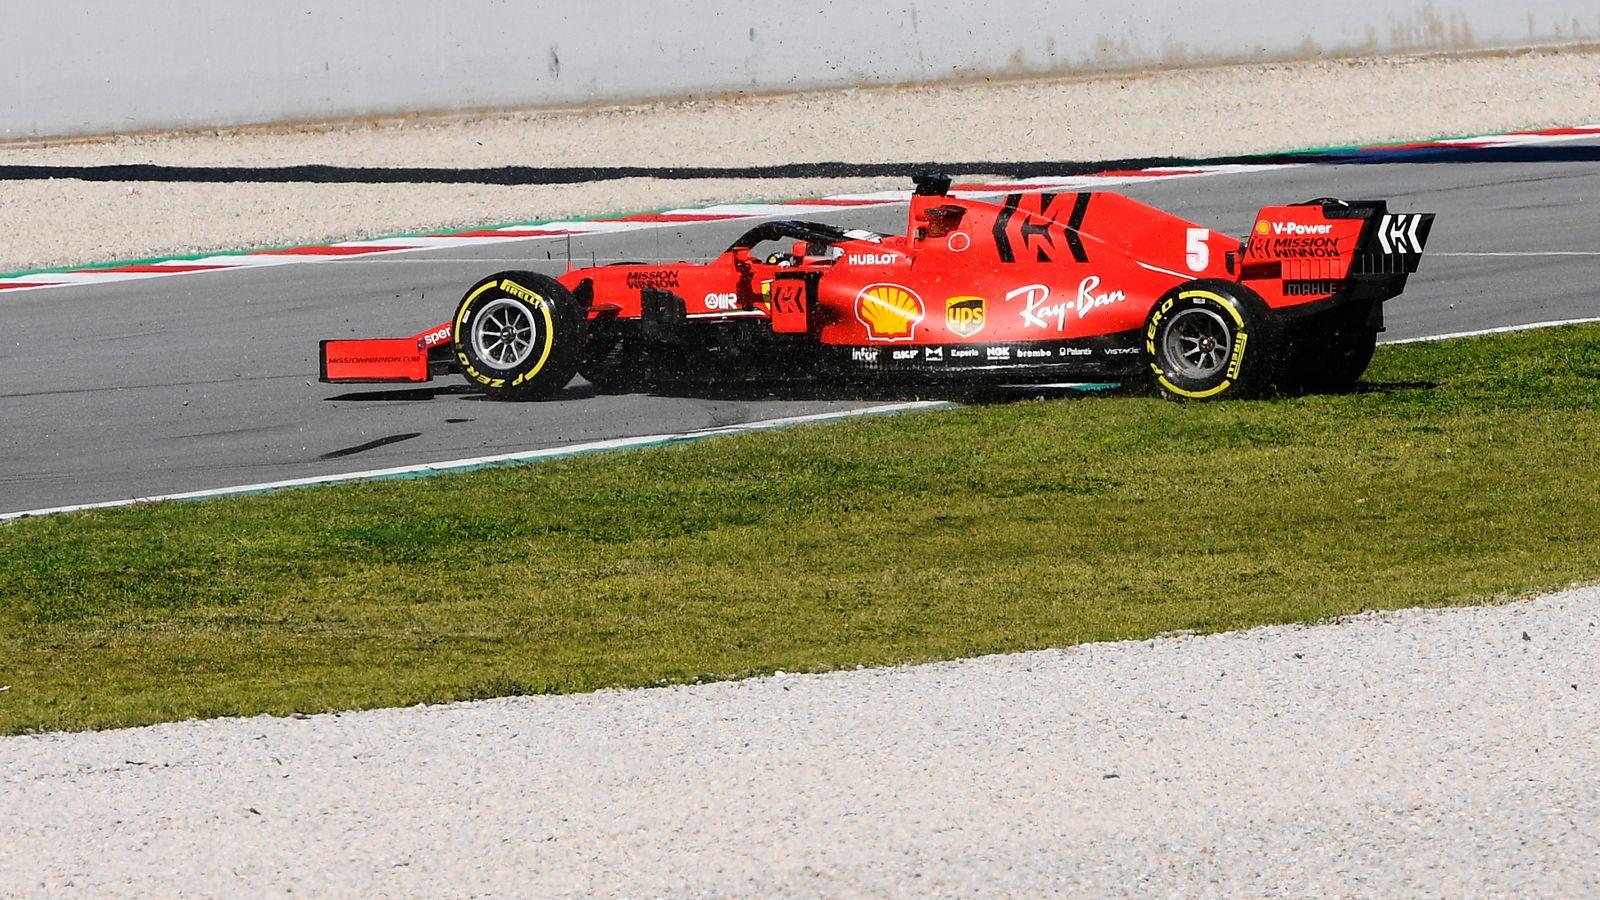 F1 Testing, Test Two Day One AM: Robert Kubica ahead, Sebastian Vettel spins off in Ferrari